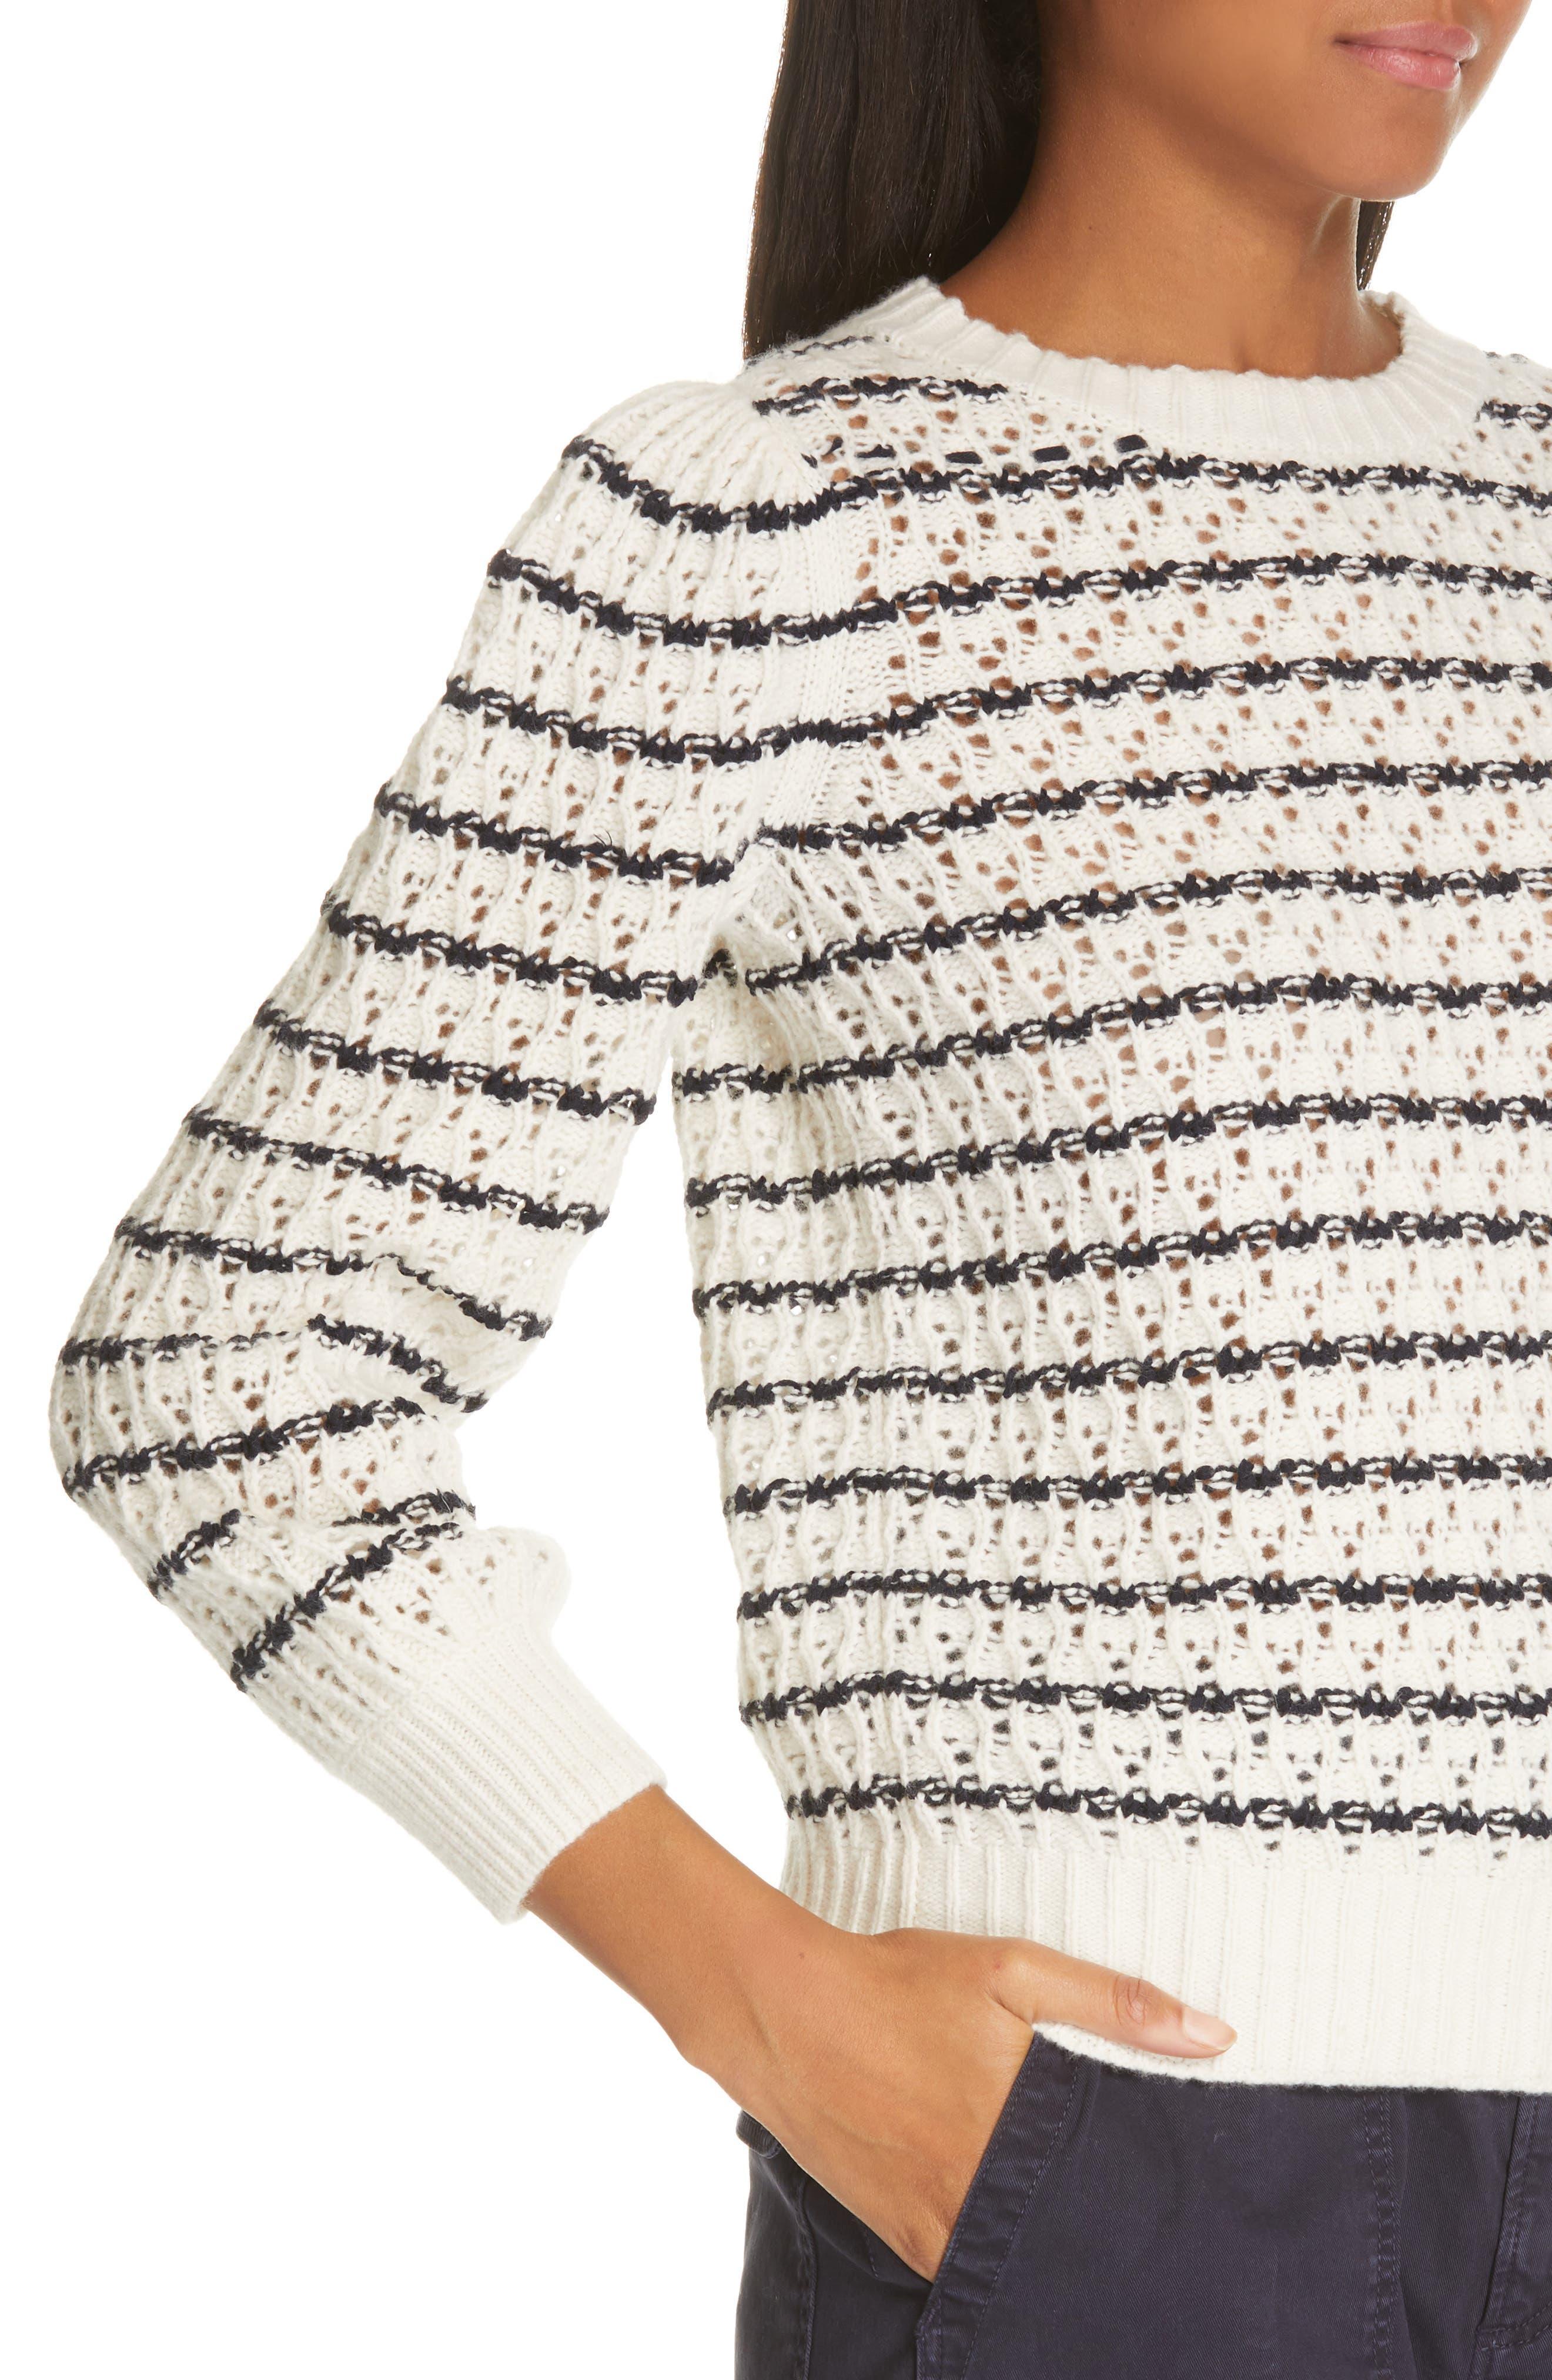 LA VIE REBECCA TAYLOR,                             Stripe Pointelle Sweater,                             Alternate thumbnail 4, color,                             ECRU/ MIDNIGHT NAVY